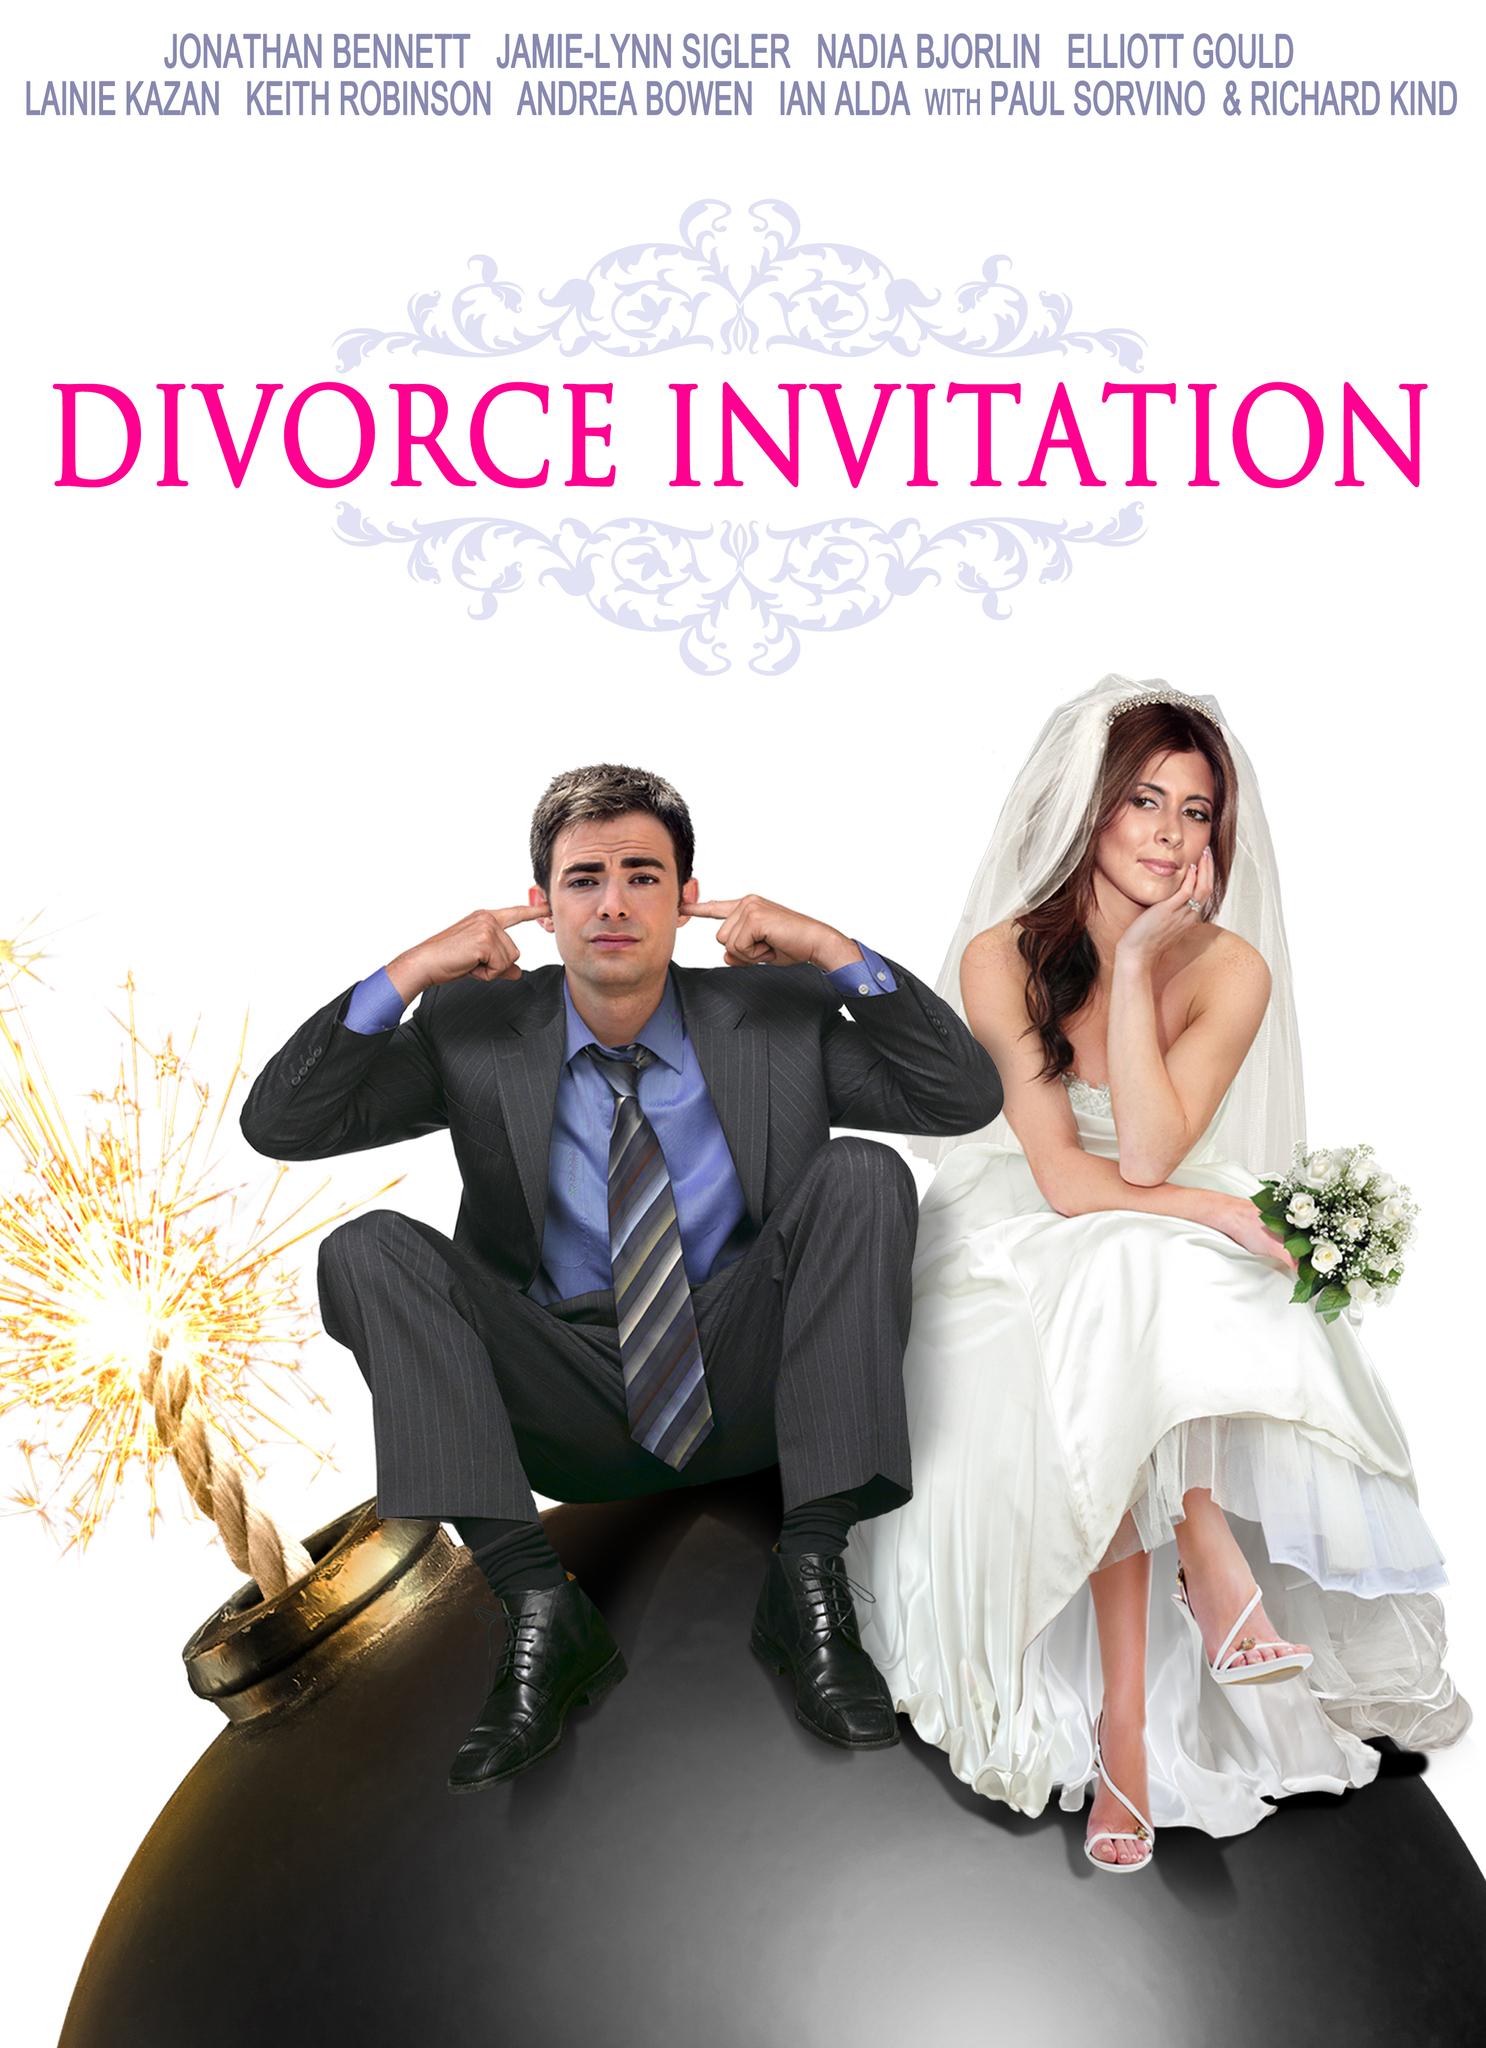 Divorce Invitation 2012 Imdb